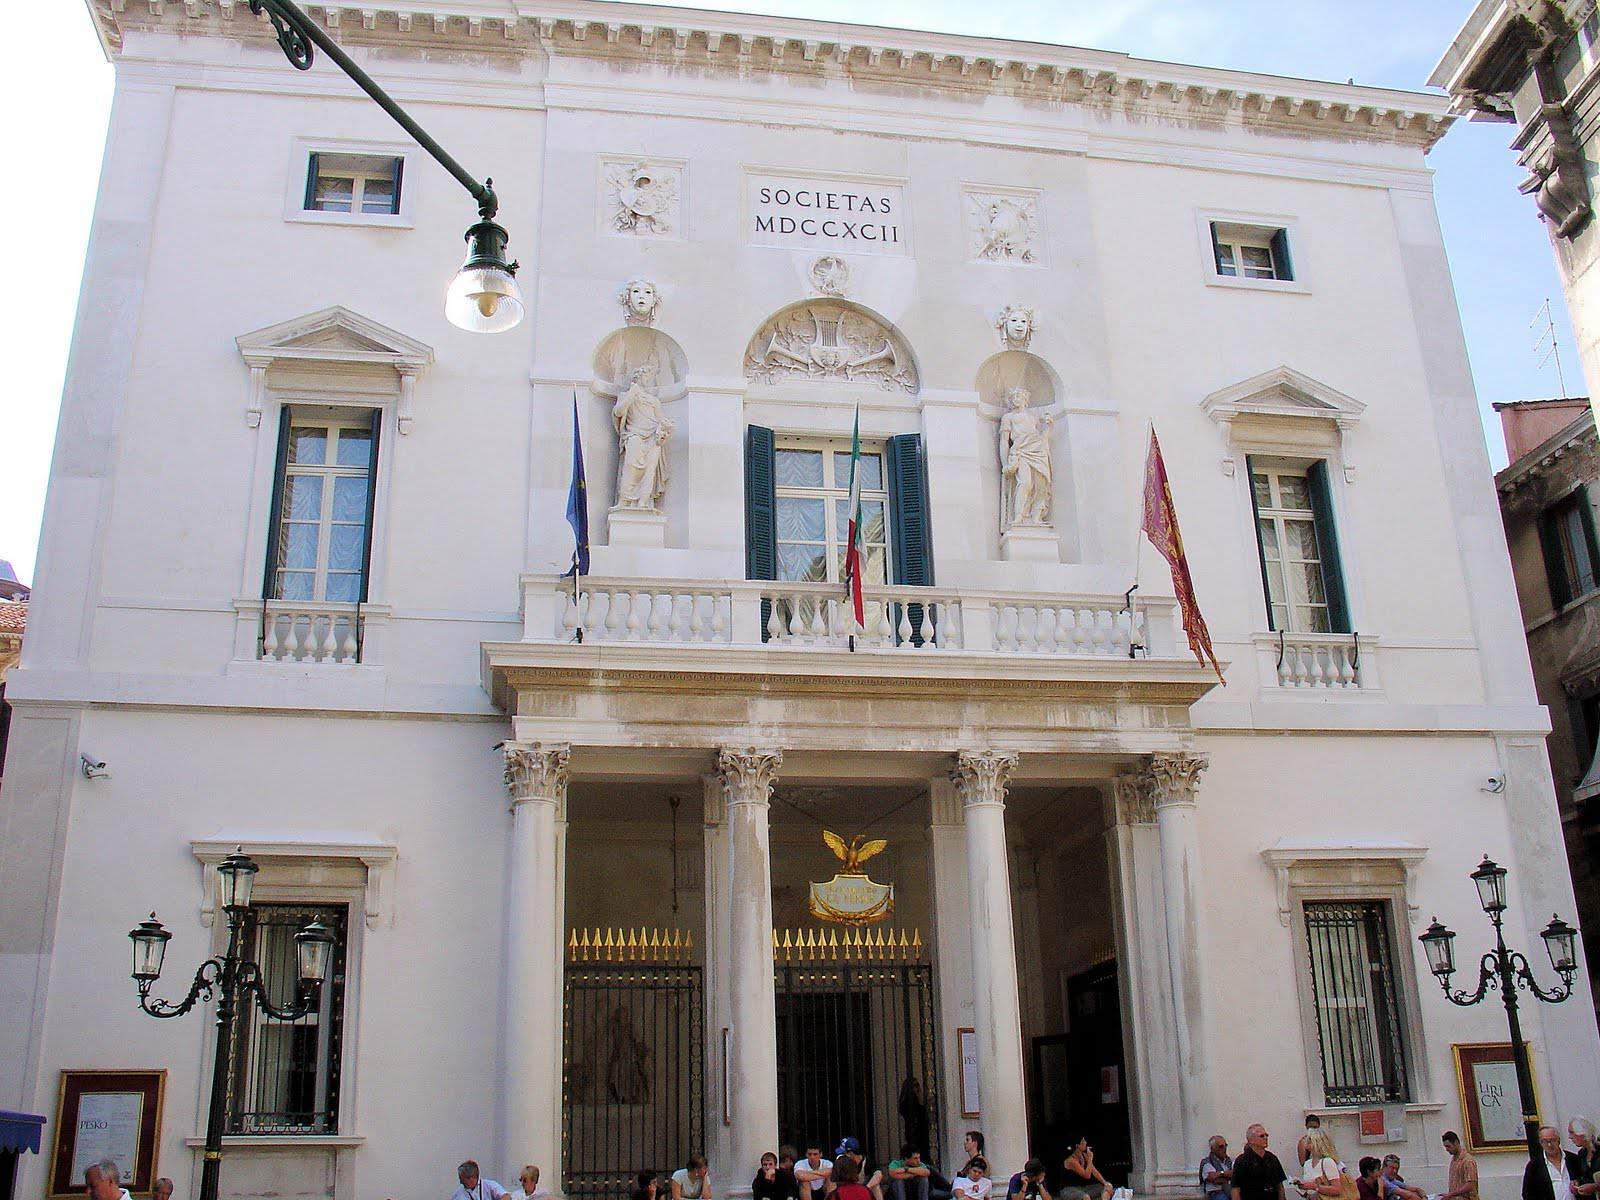 5 Teatro la Fenice out